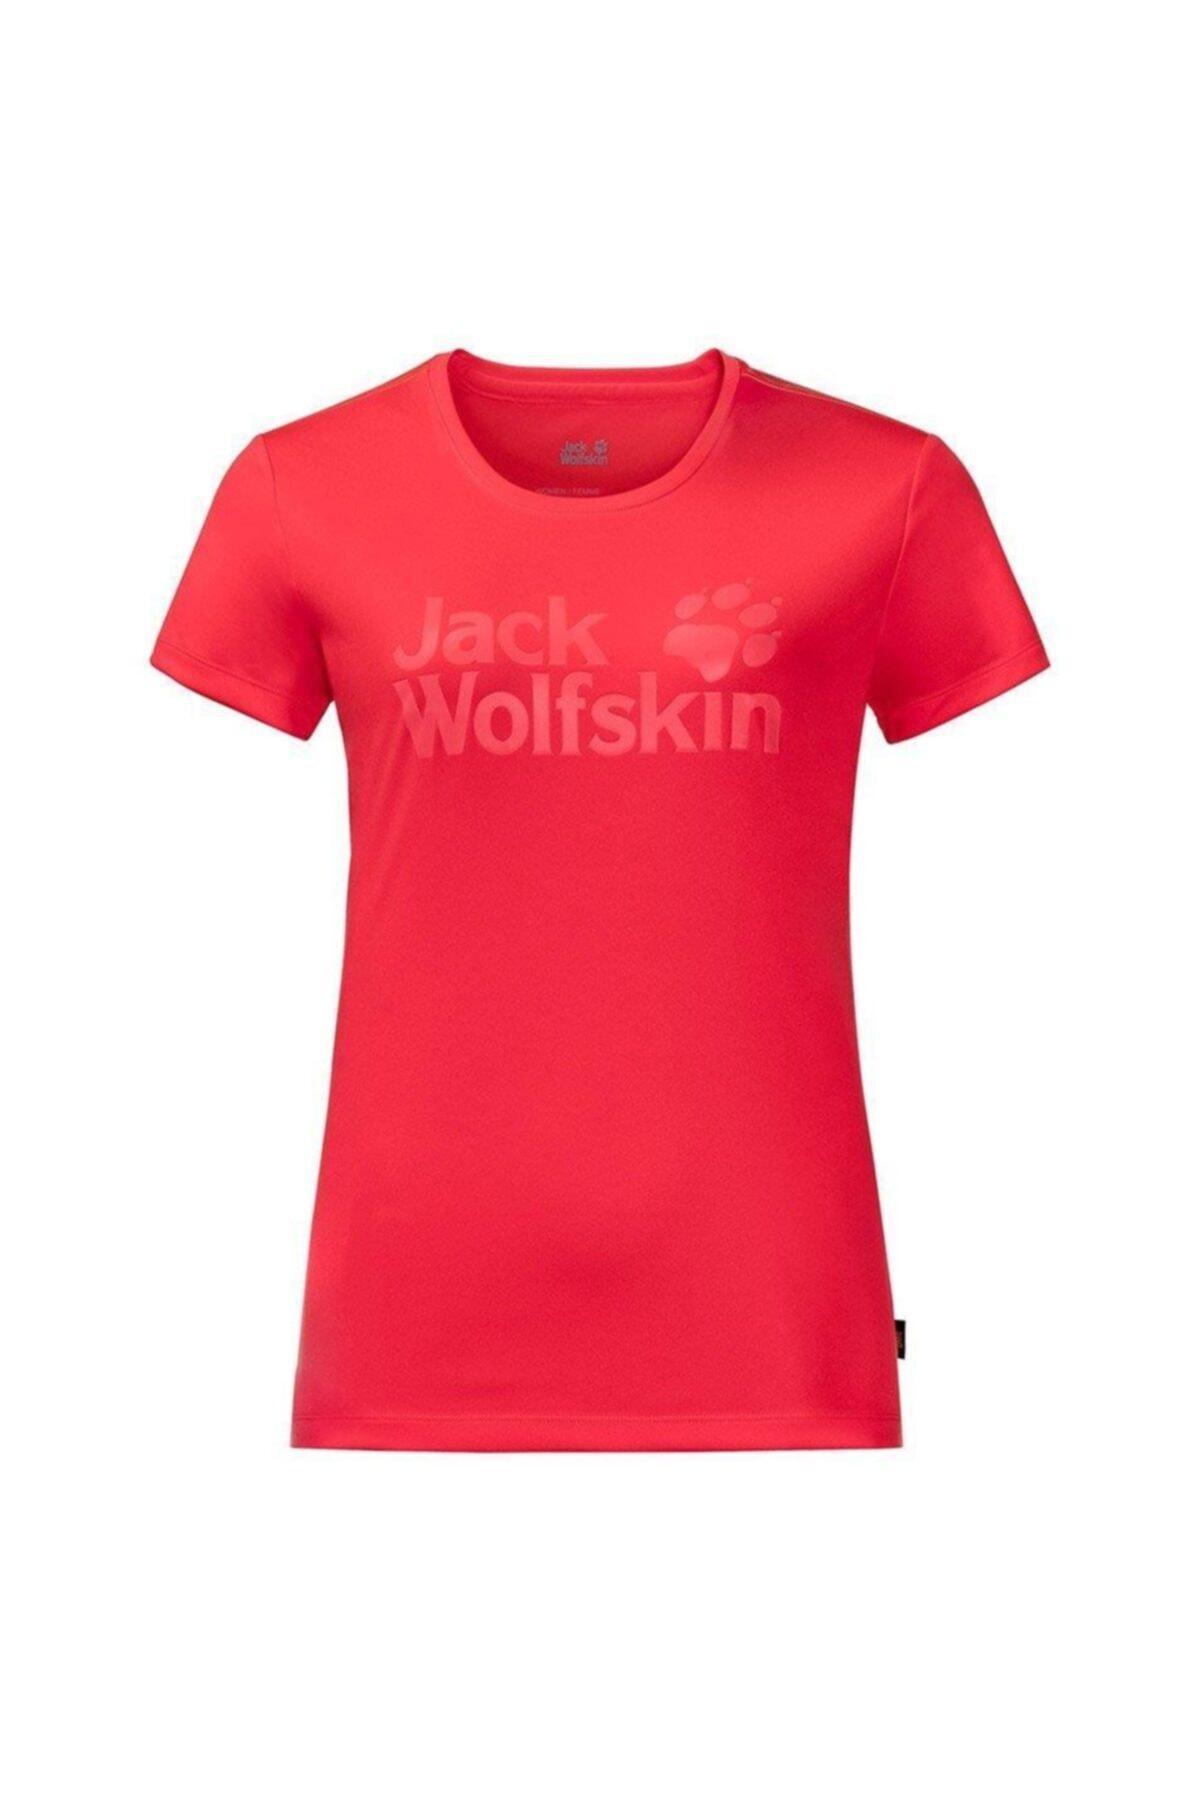 Jack Wolfskin Rock Chill Logo Kadın T-Shirt - 1805541-2058 1